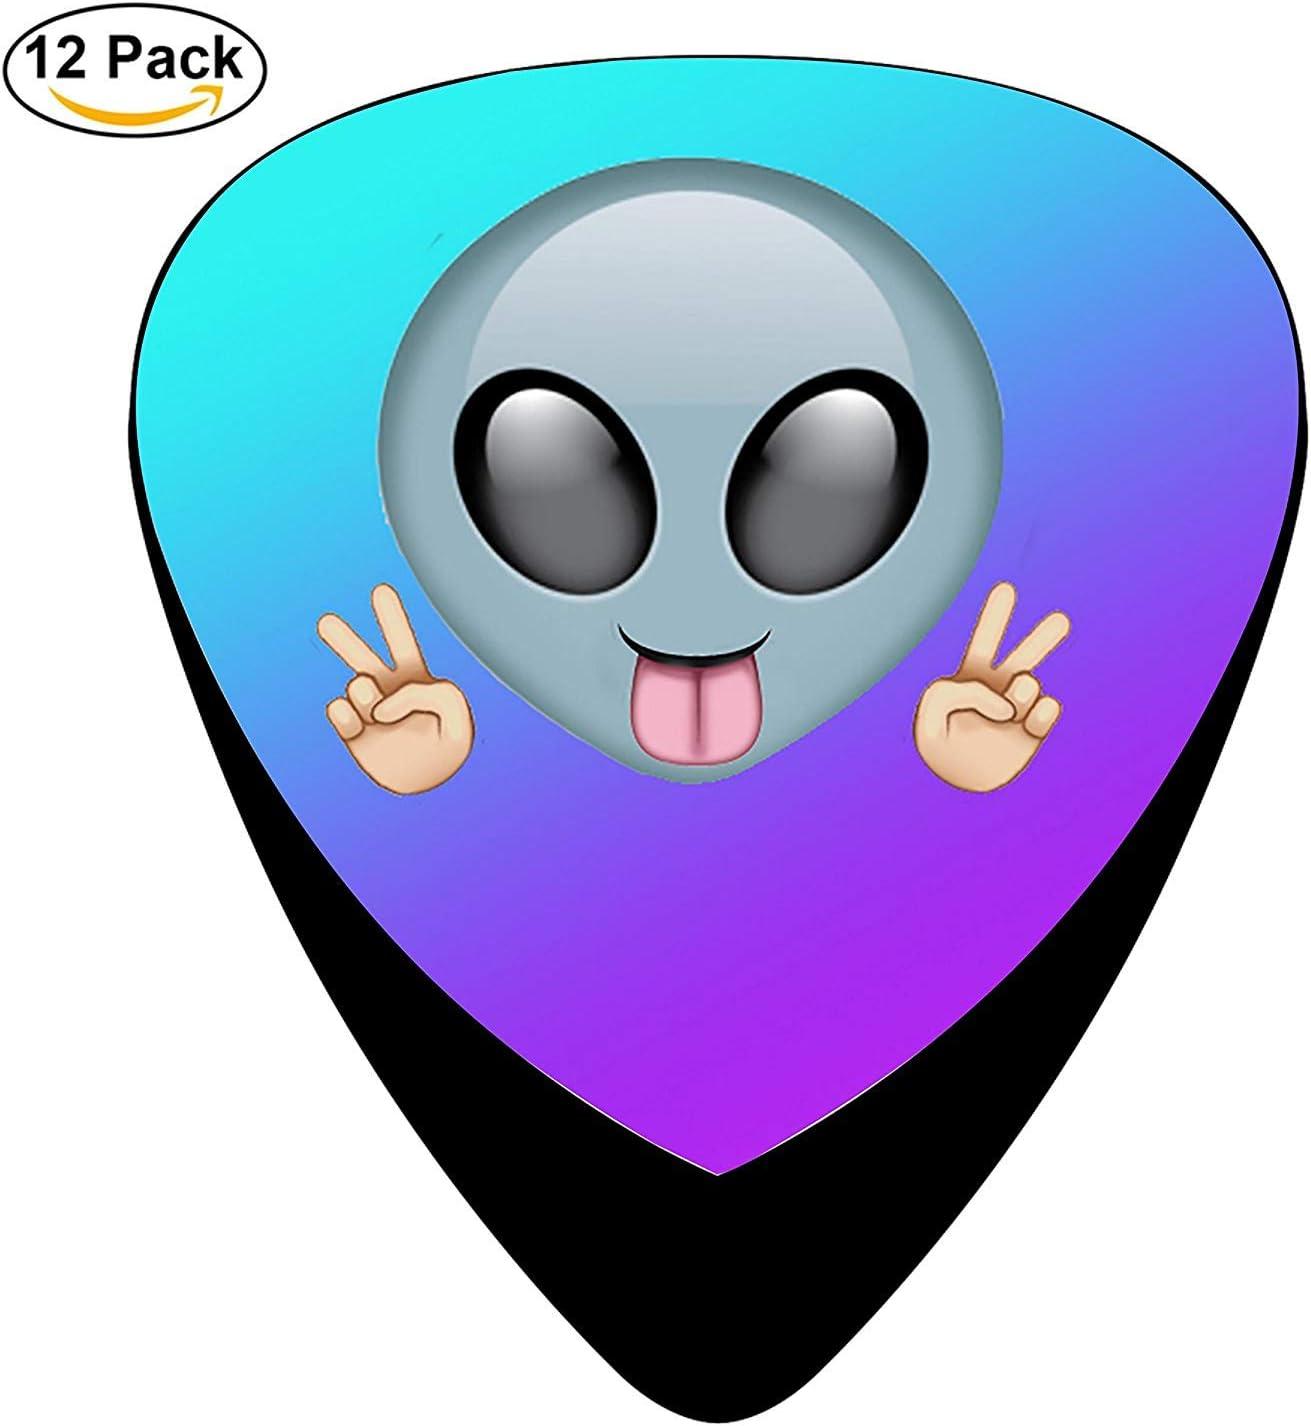 Alien Smile Face Celluloid Electric Guitar Picks 12-pack: Amazon ...